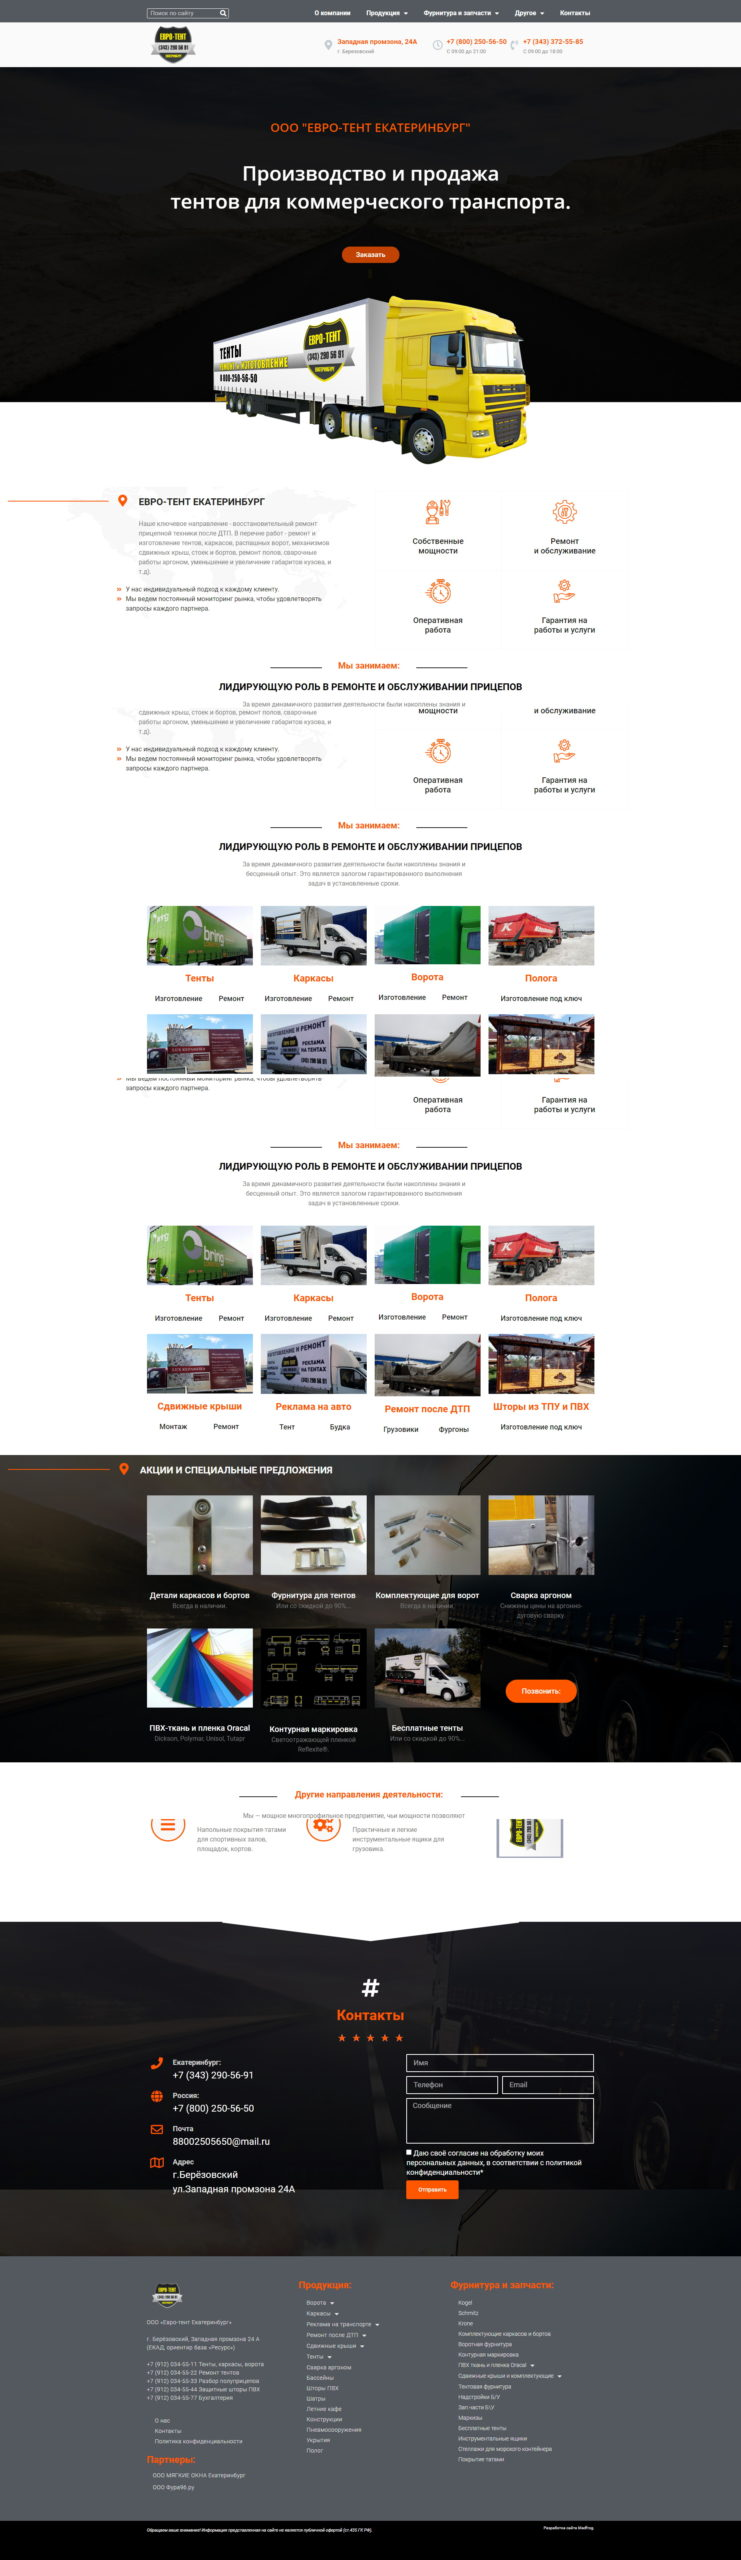 редизайн сайта евро-тент екатеринбург